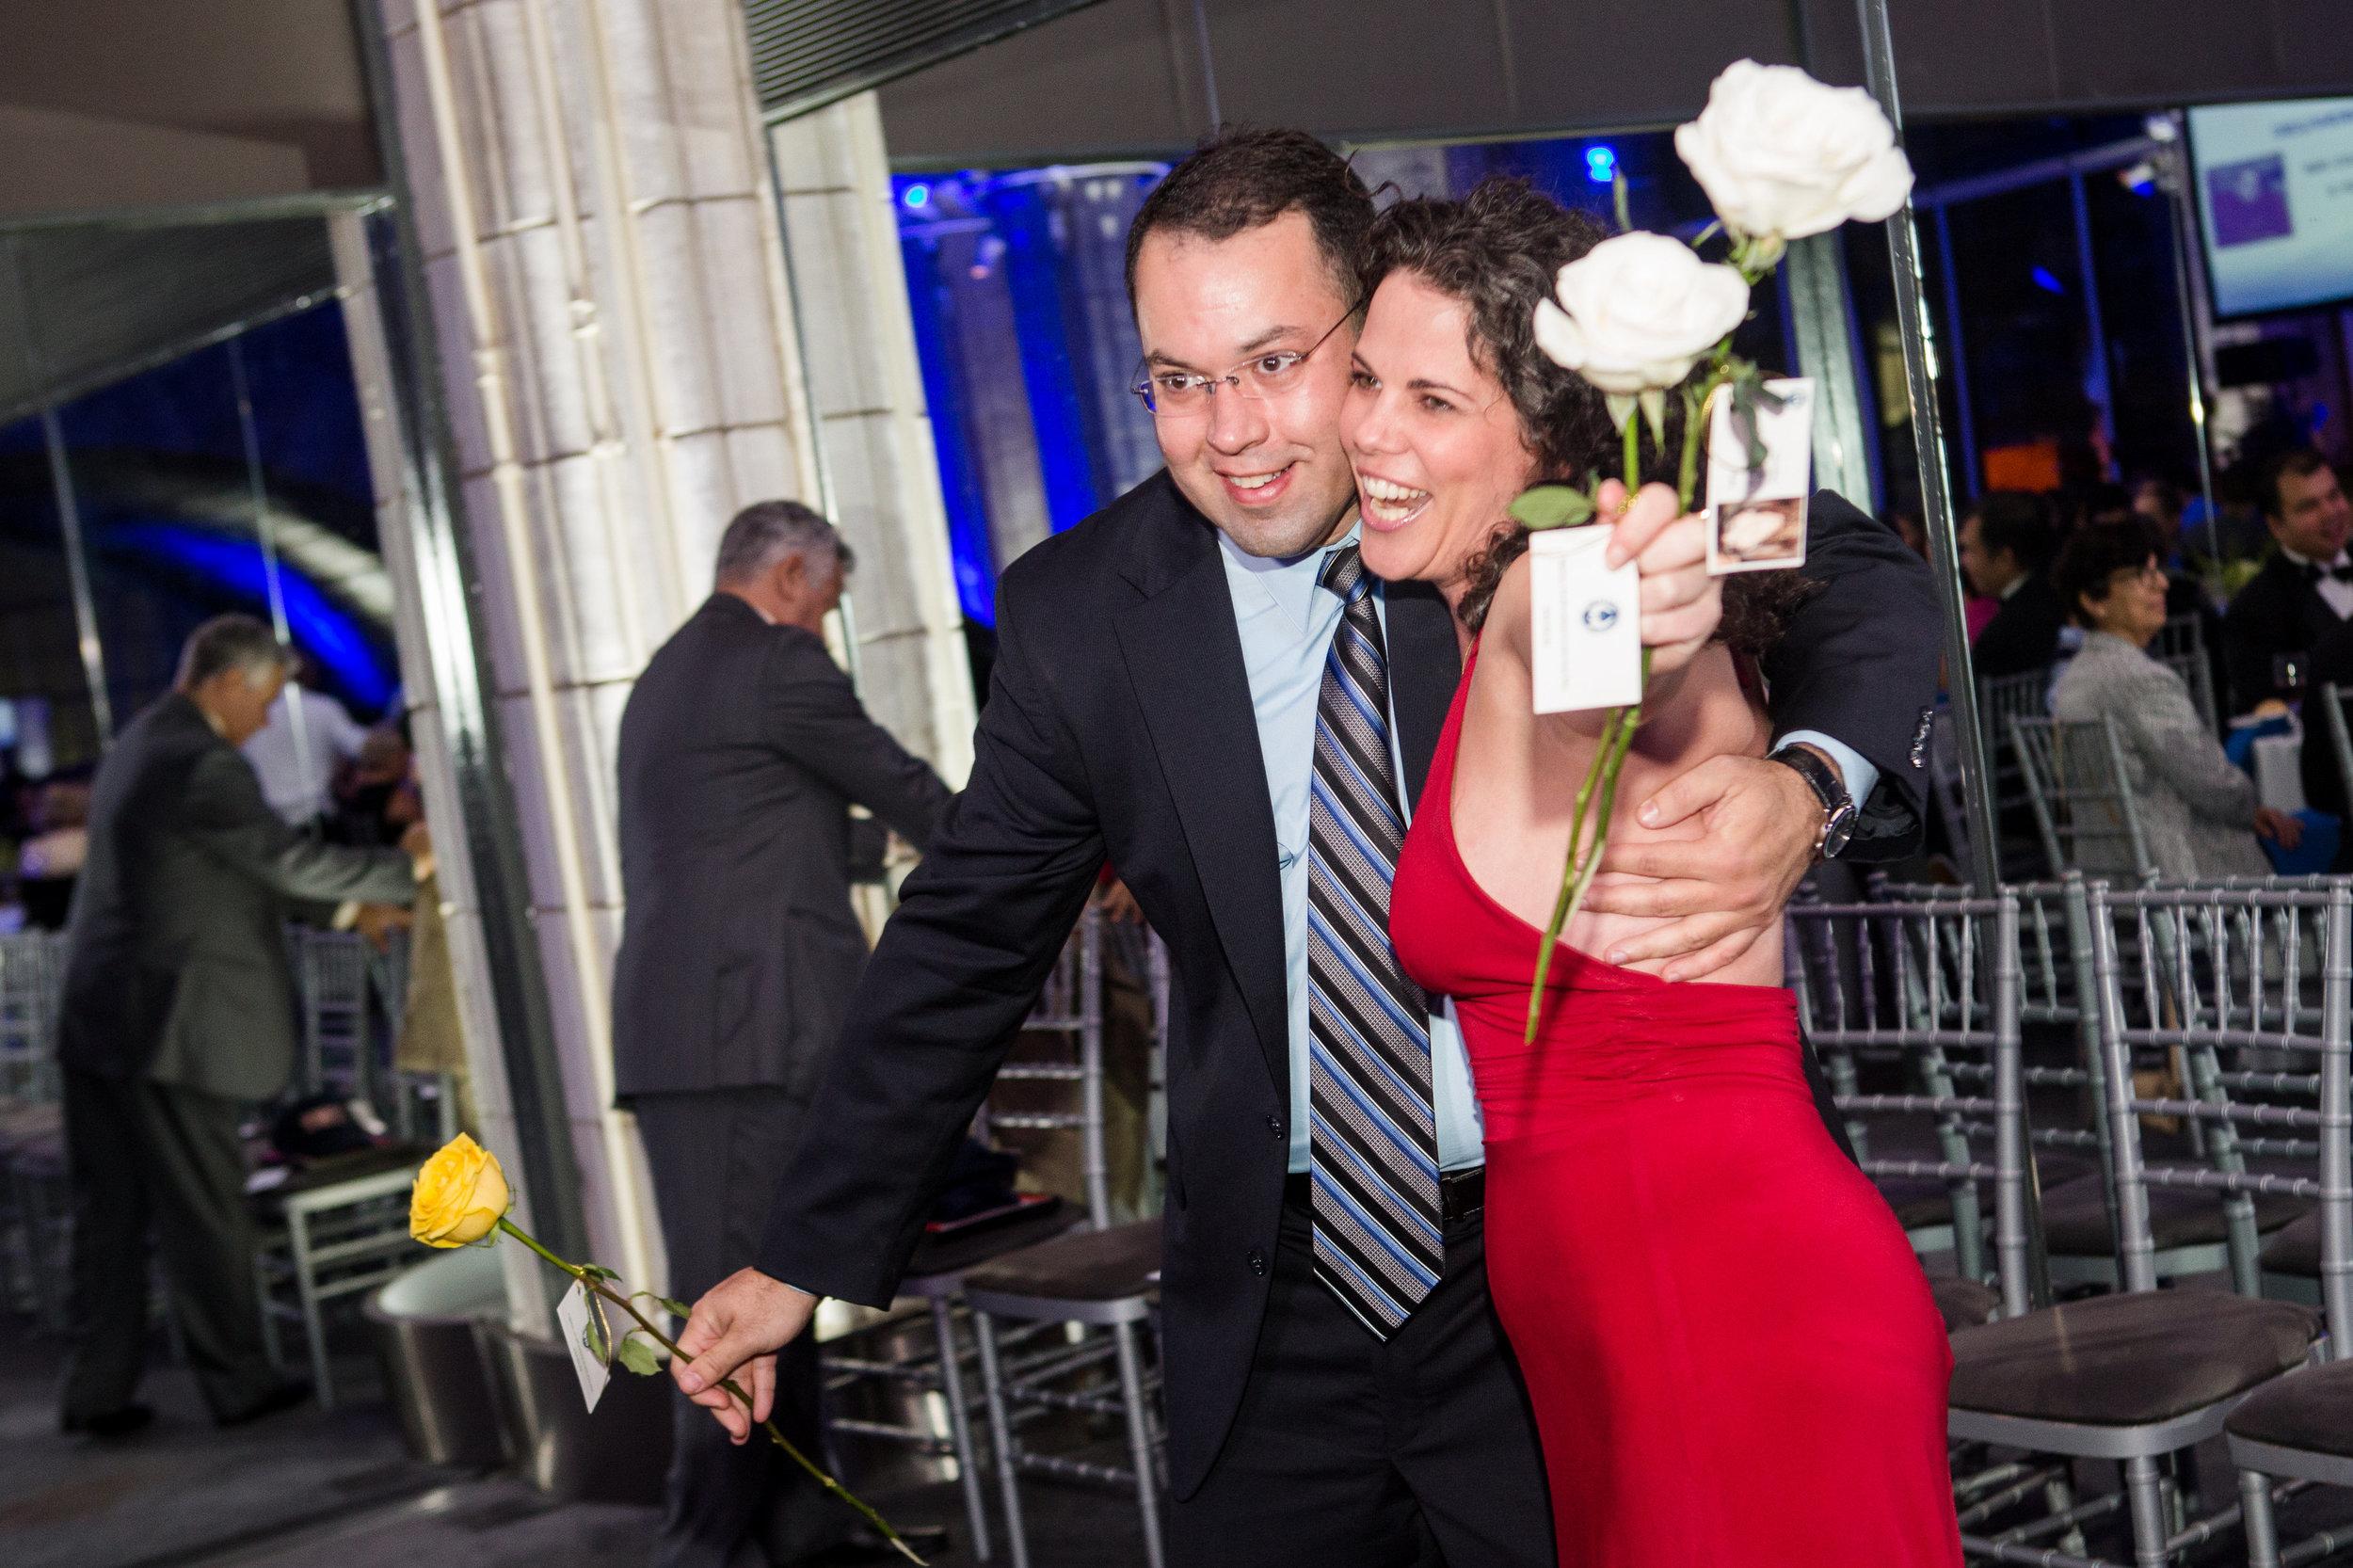 With Airam da Silva, President of the Icla da Silva at the 2014 Hope Gala in New York City.